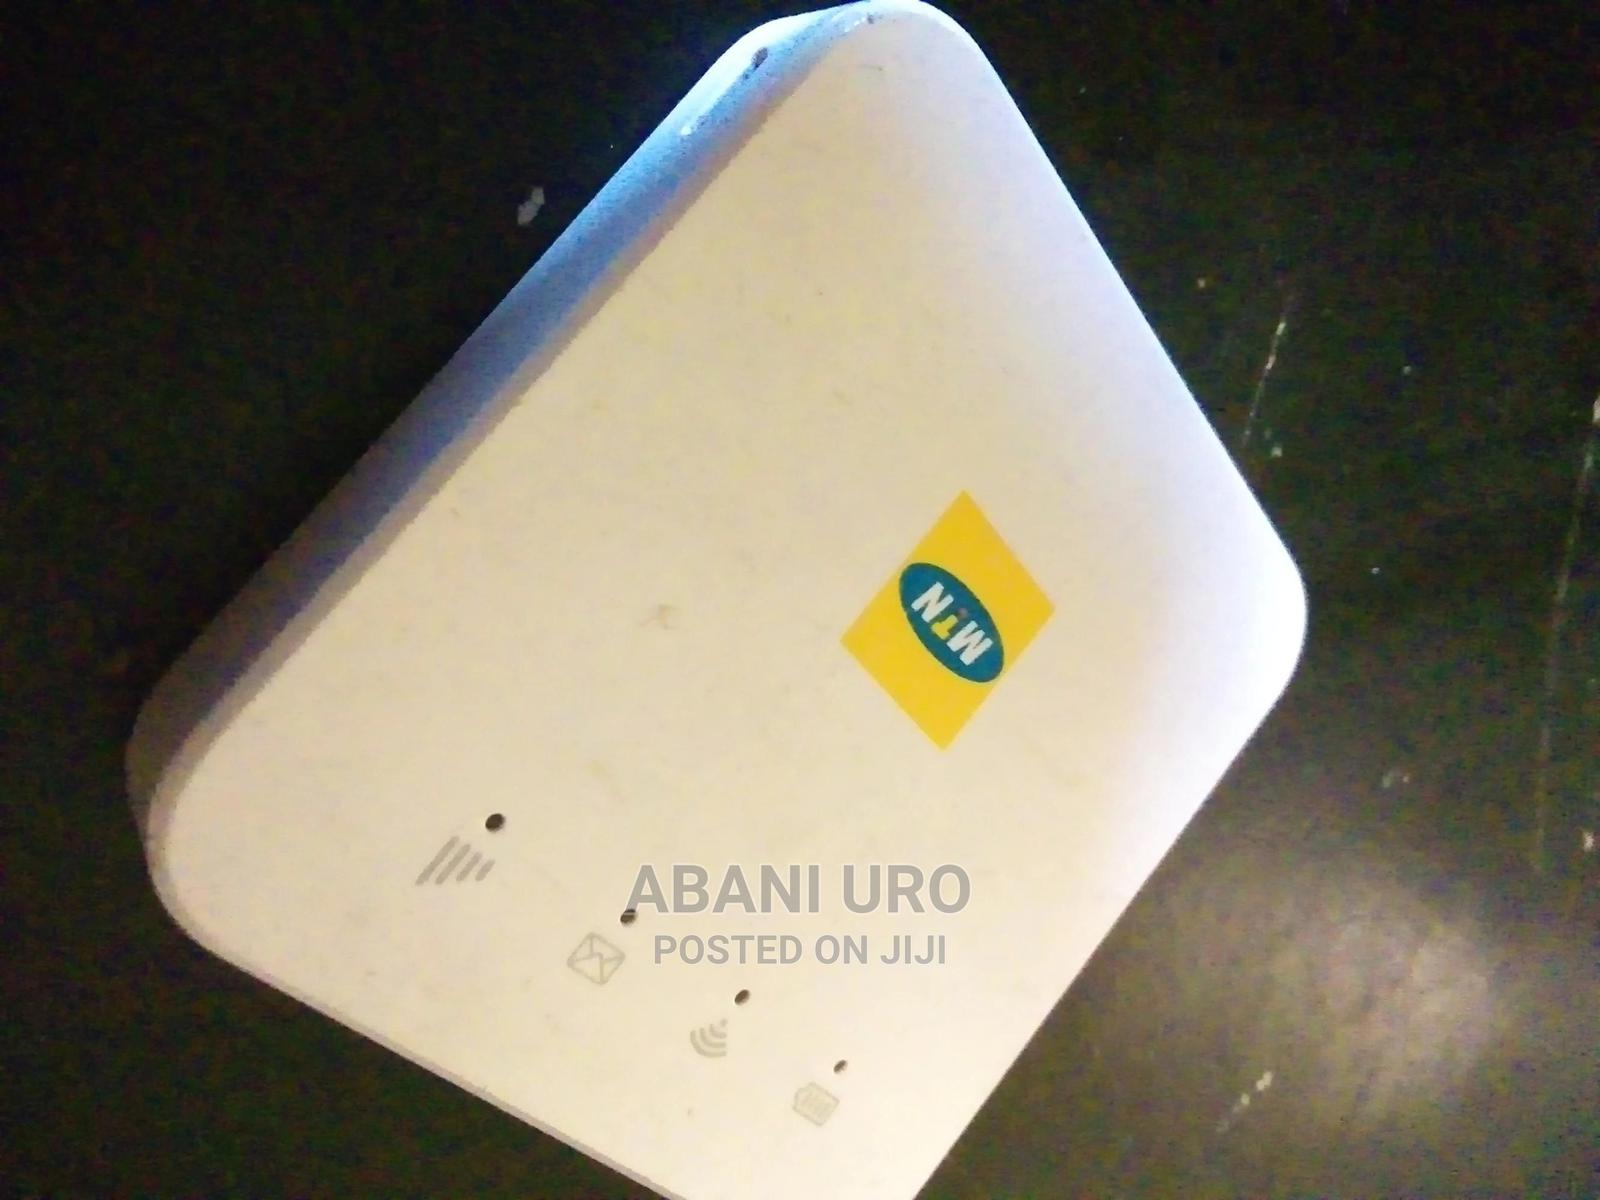 Archive: MTN Zte Wi-Fi